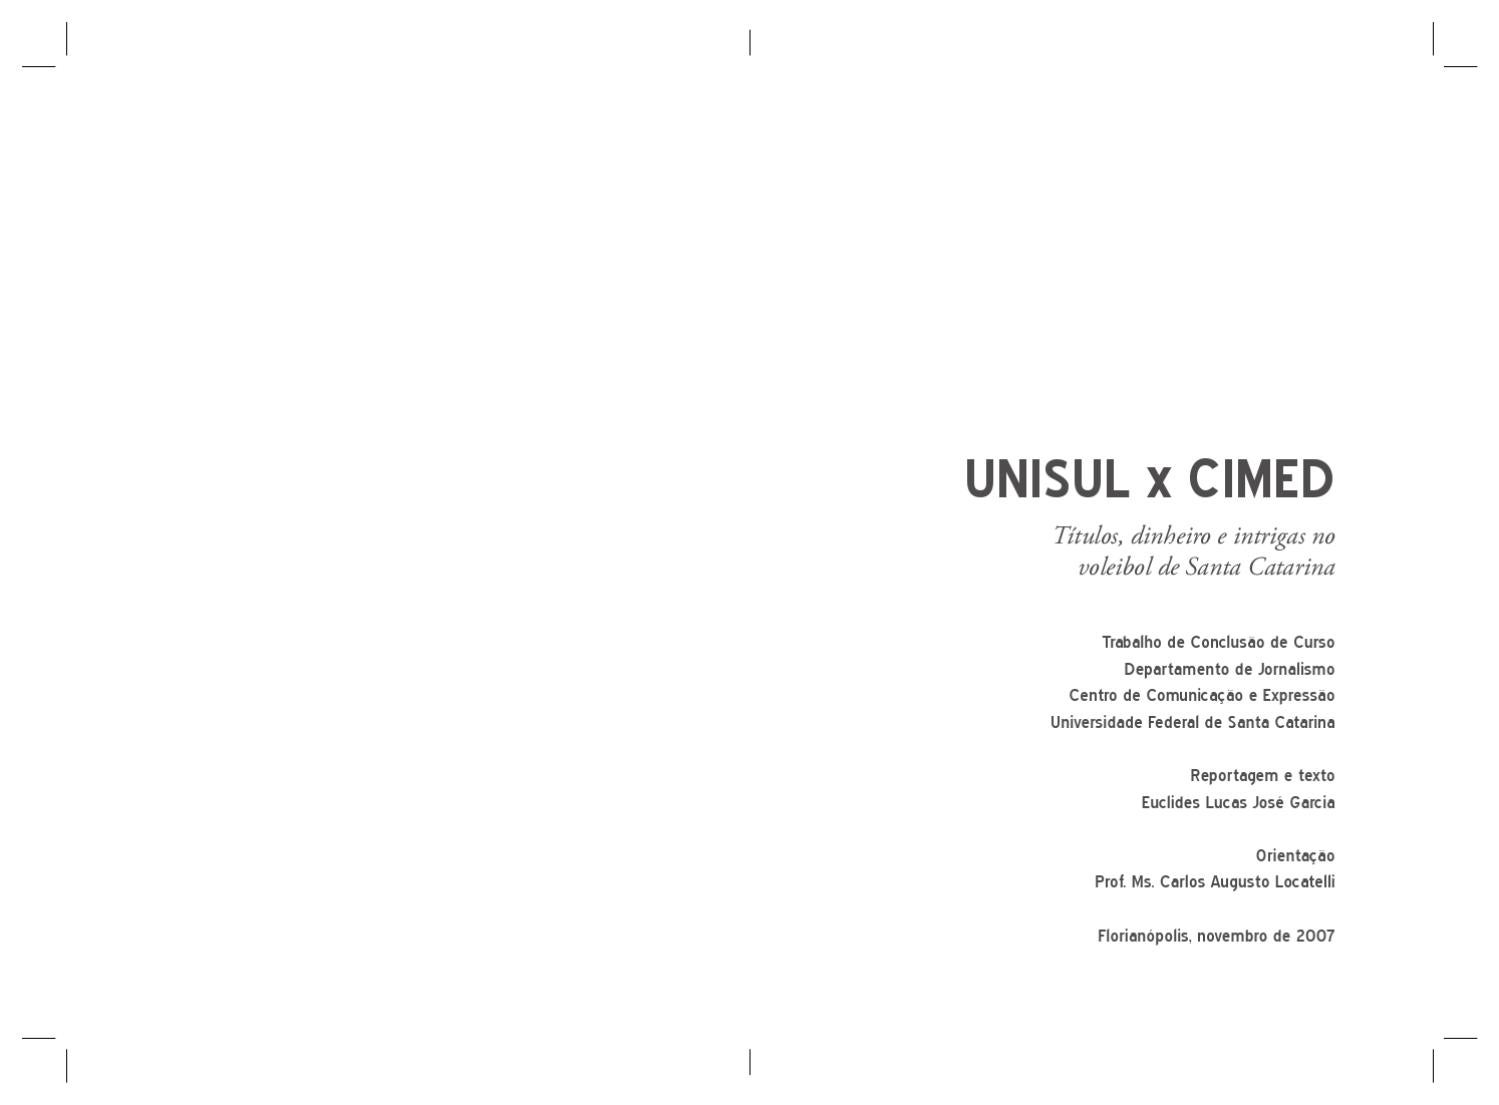 TCC Unisul x Cimed by Dirceu Neto - issuu dc8929dea7149